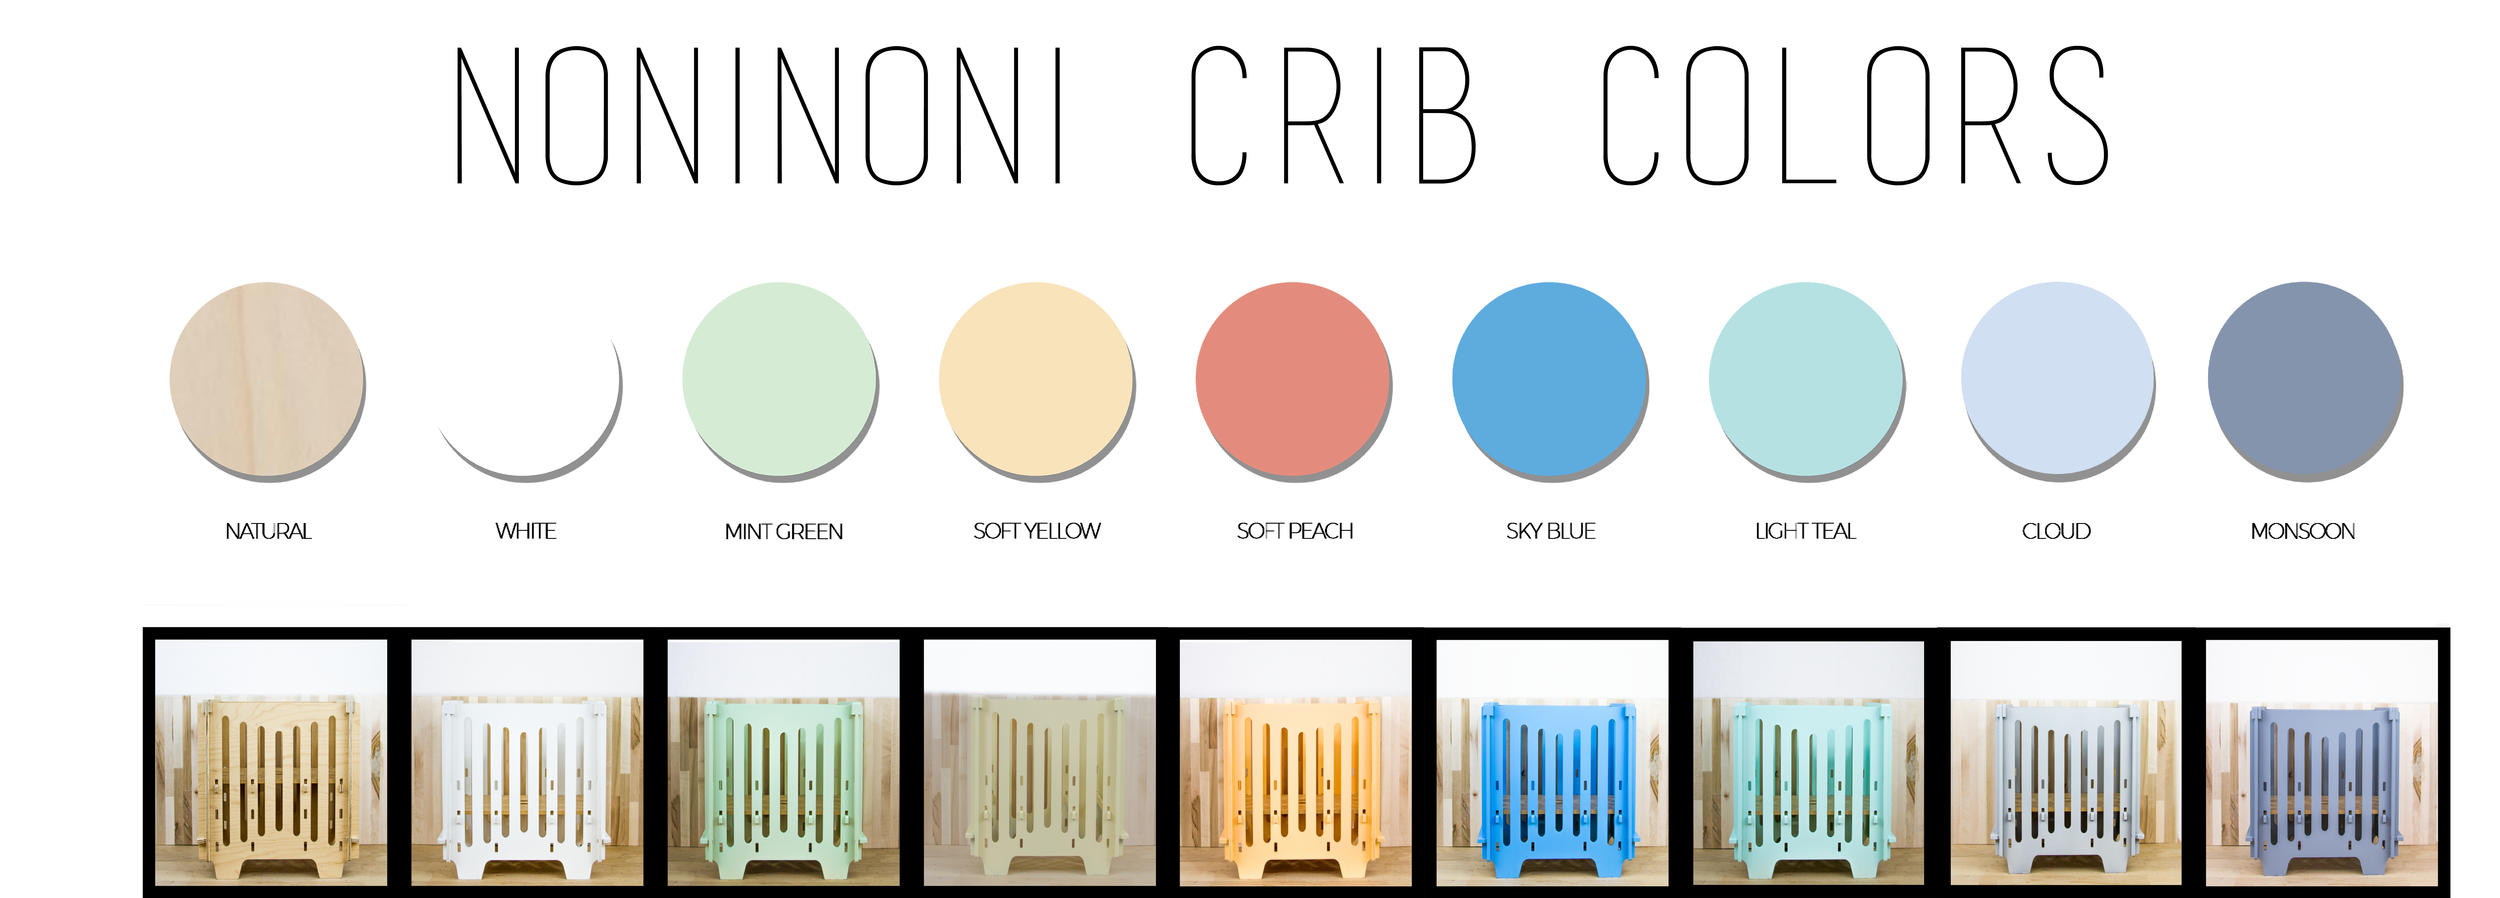 crib colors.png